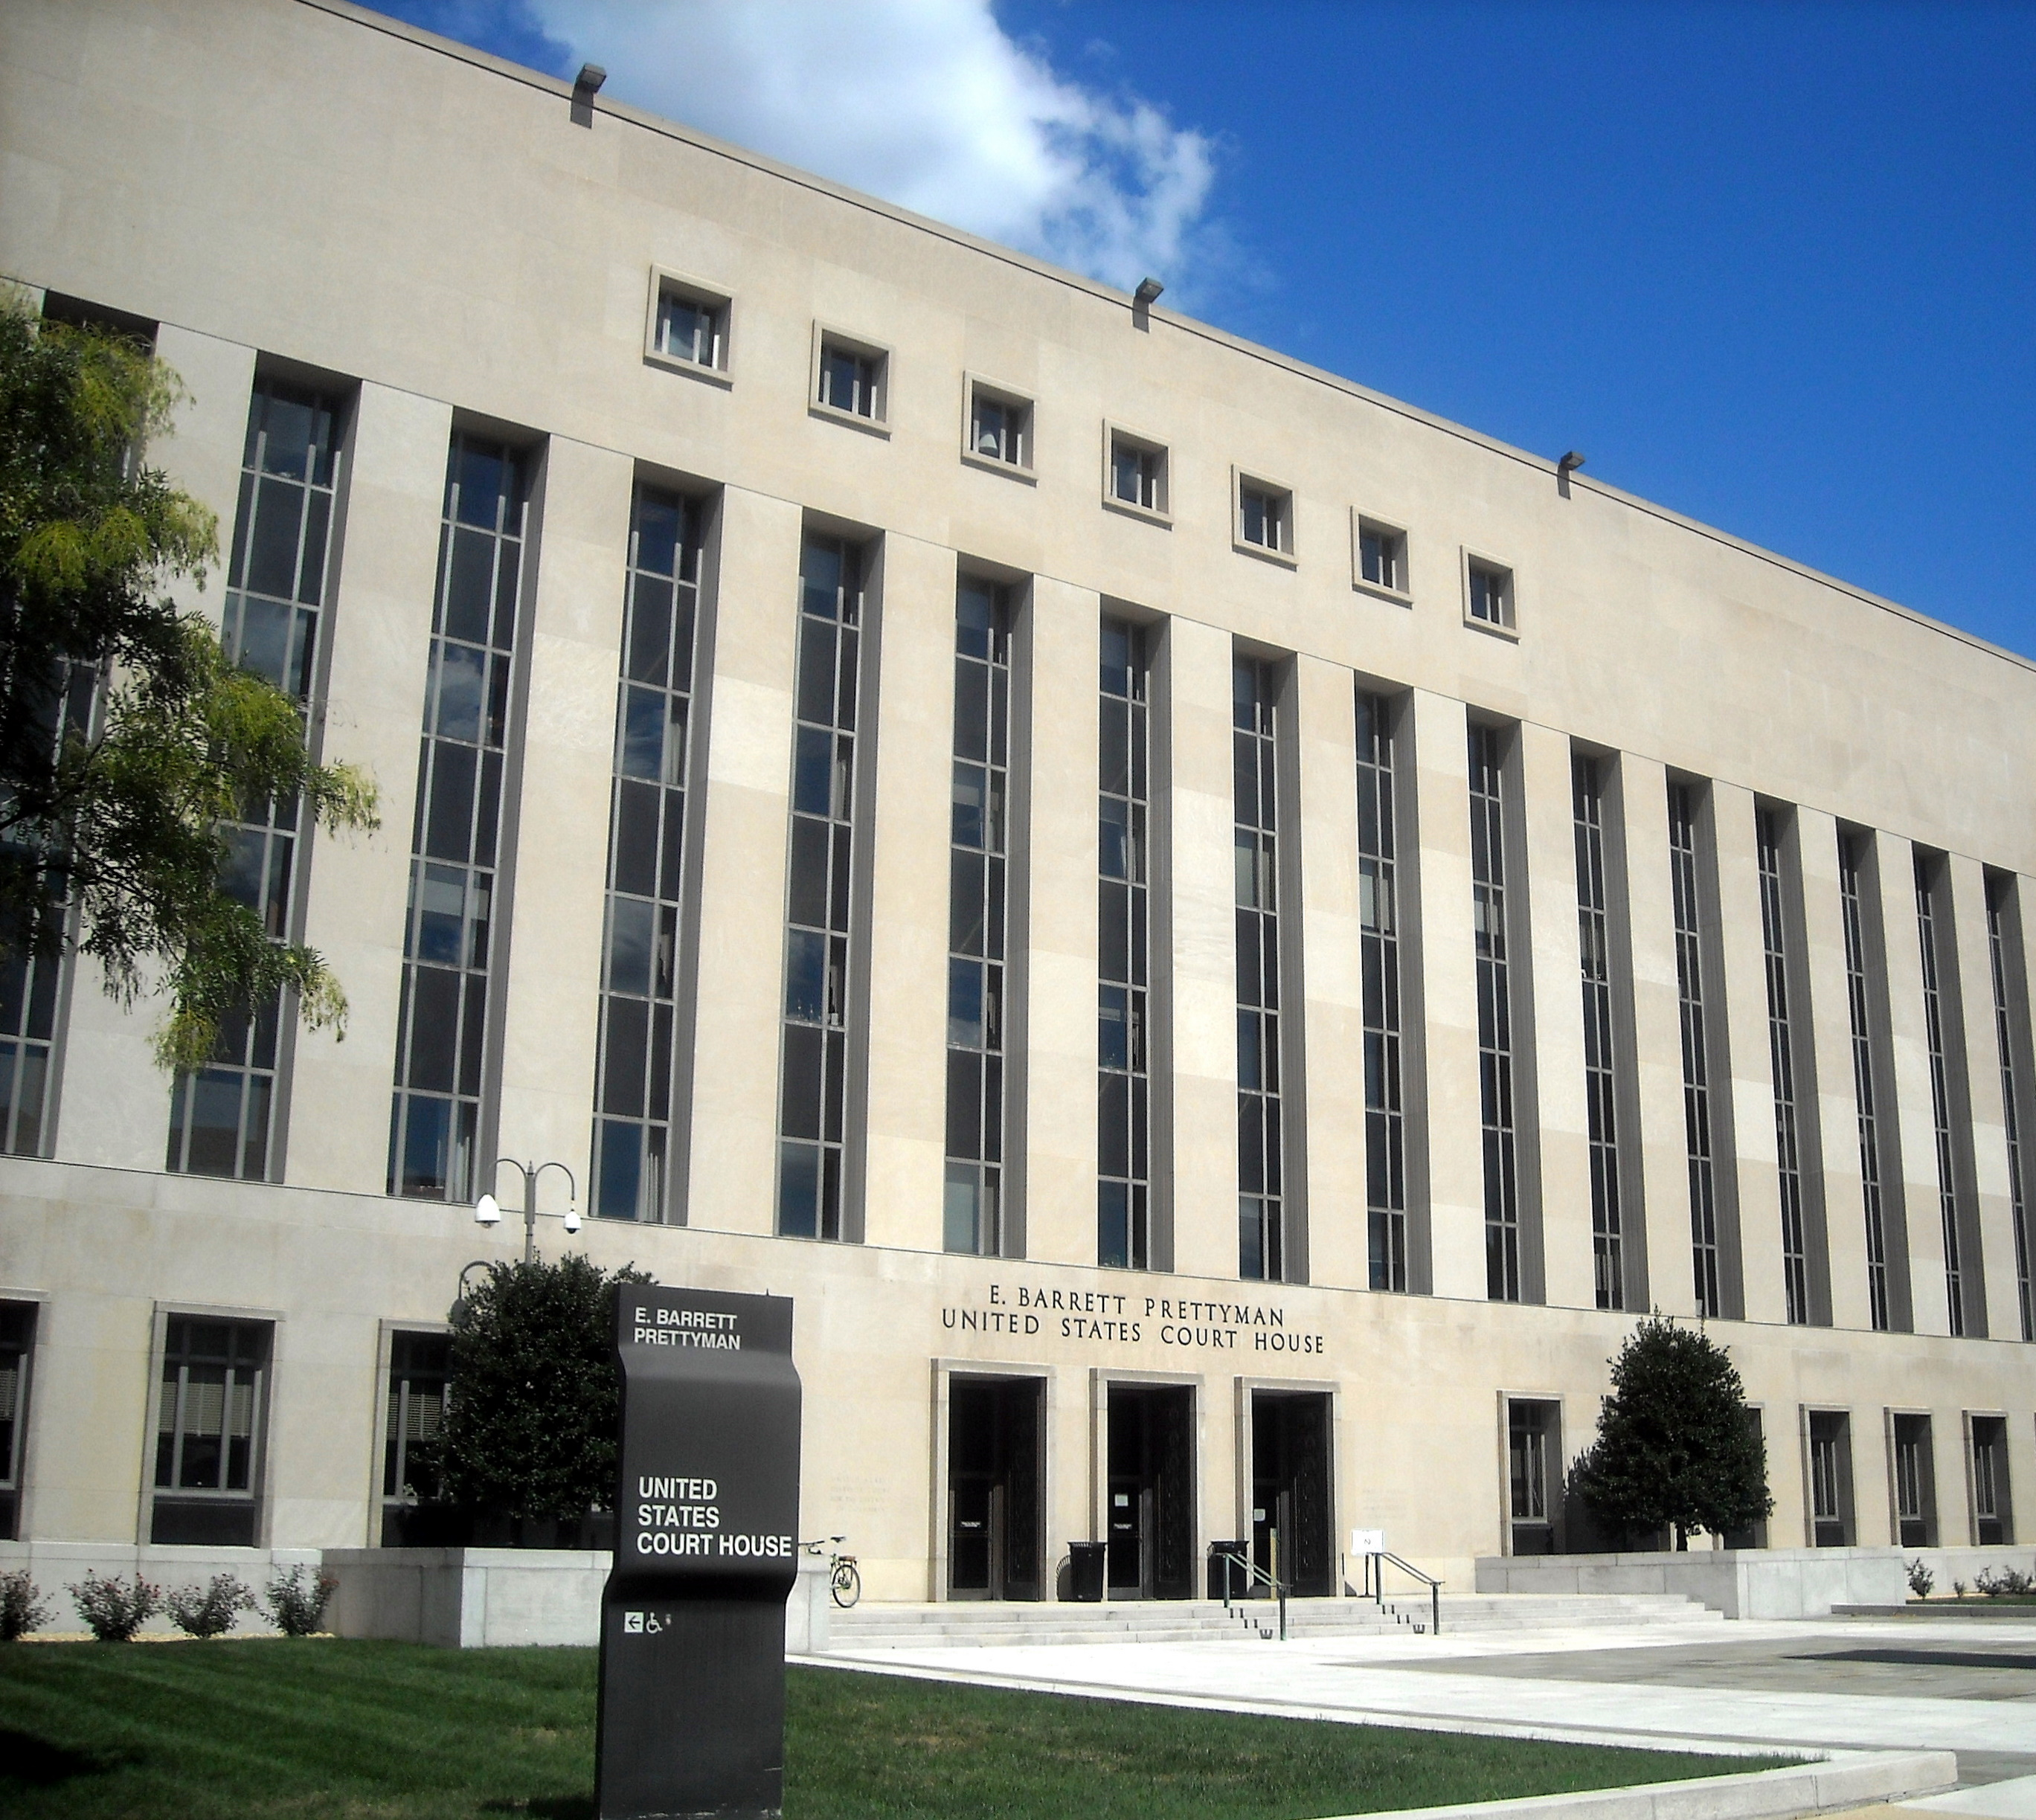 https://upload.wikimedia.org/wikipedia/commons/4/49/E._Barrett_Prettyman_Federal_Courthouse%2C_DC.jpg